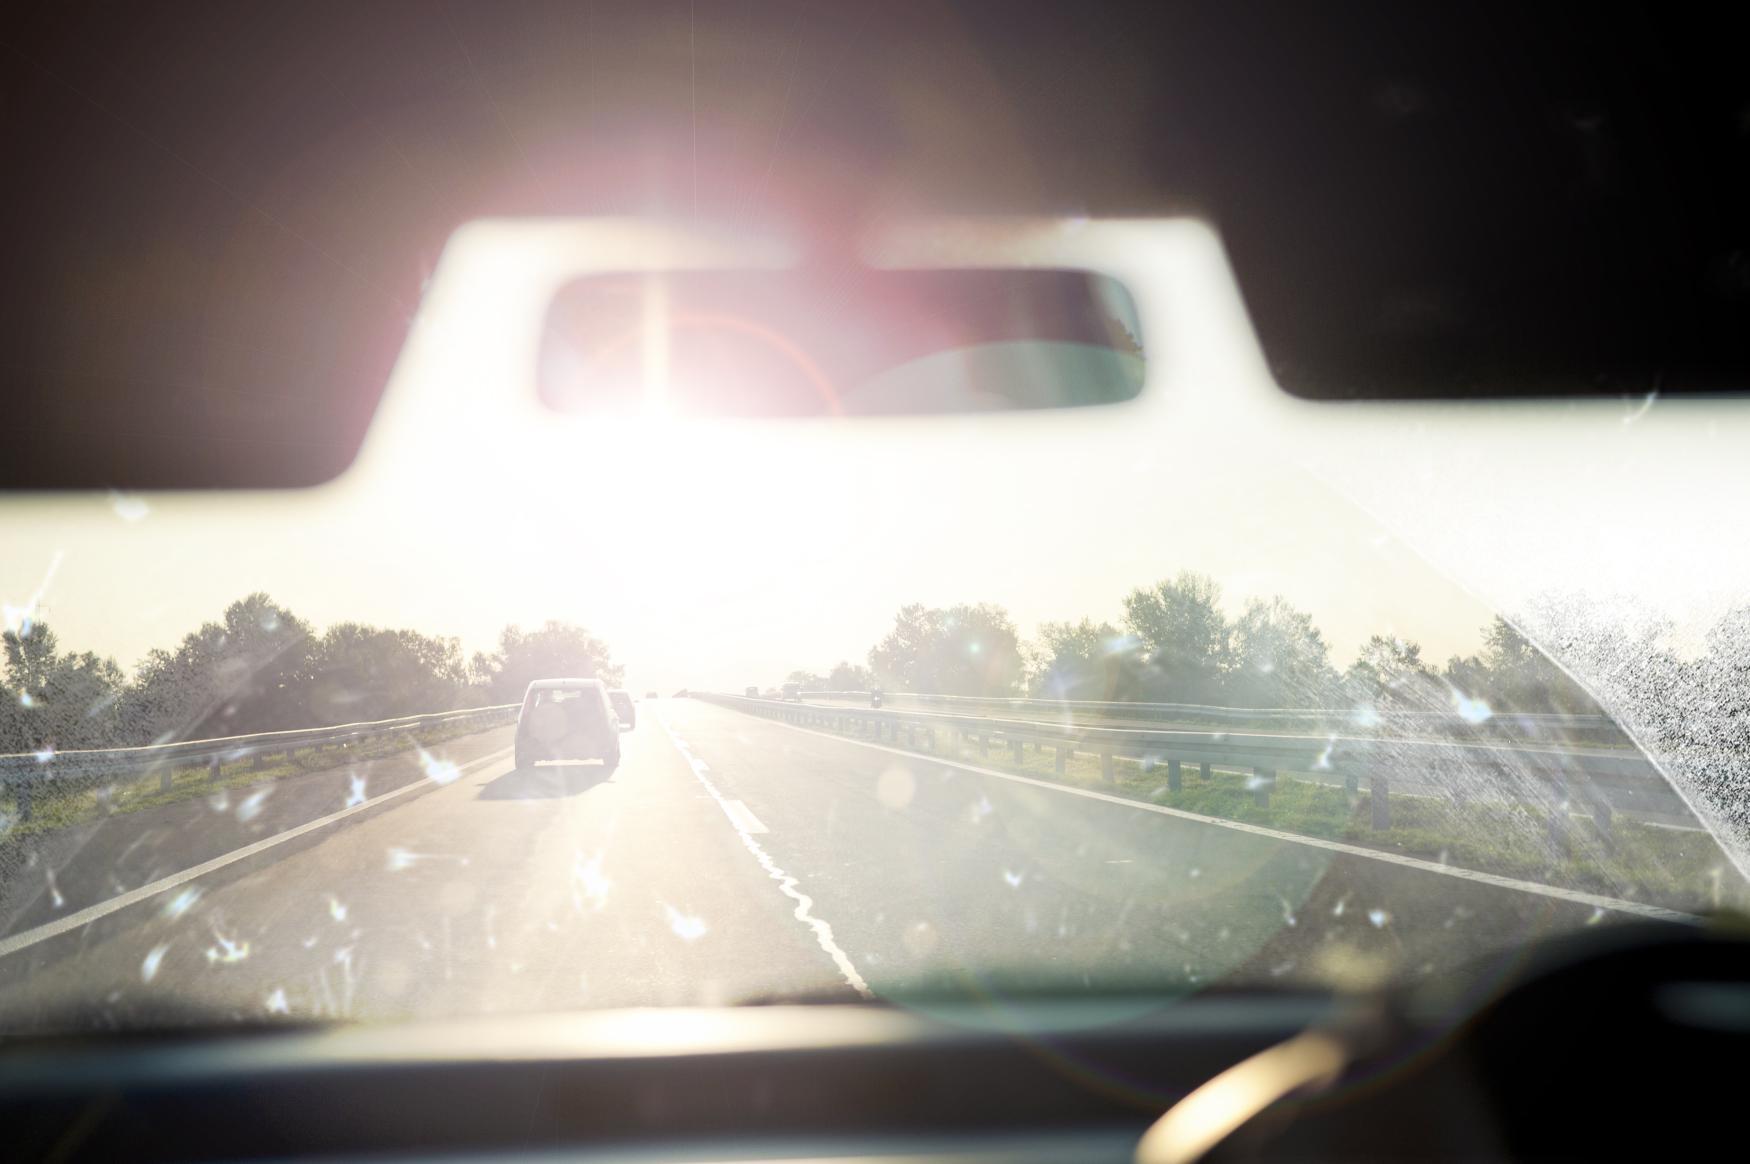 Dirty windscreen